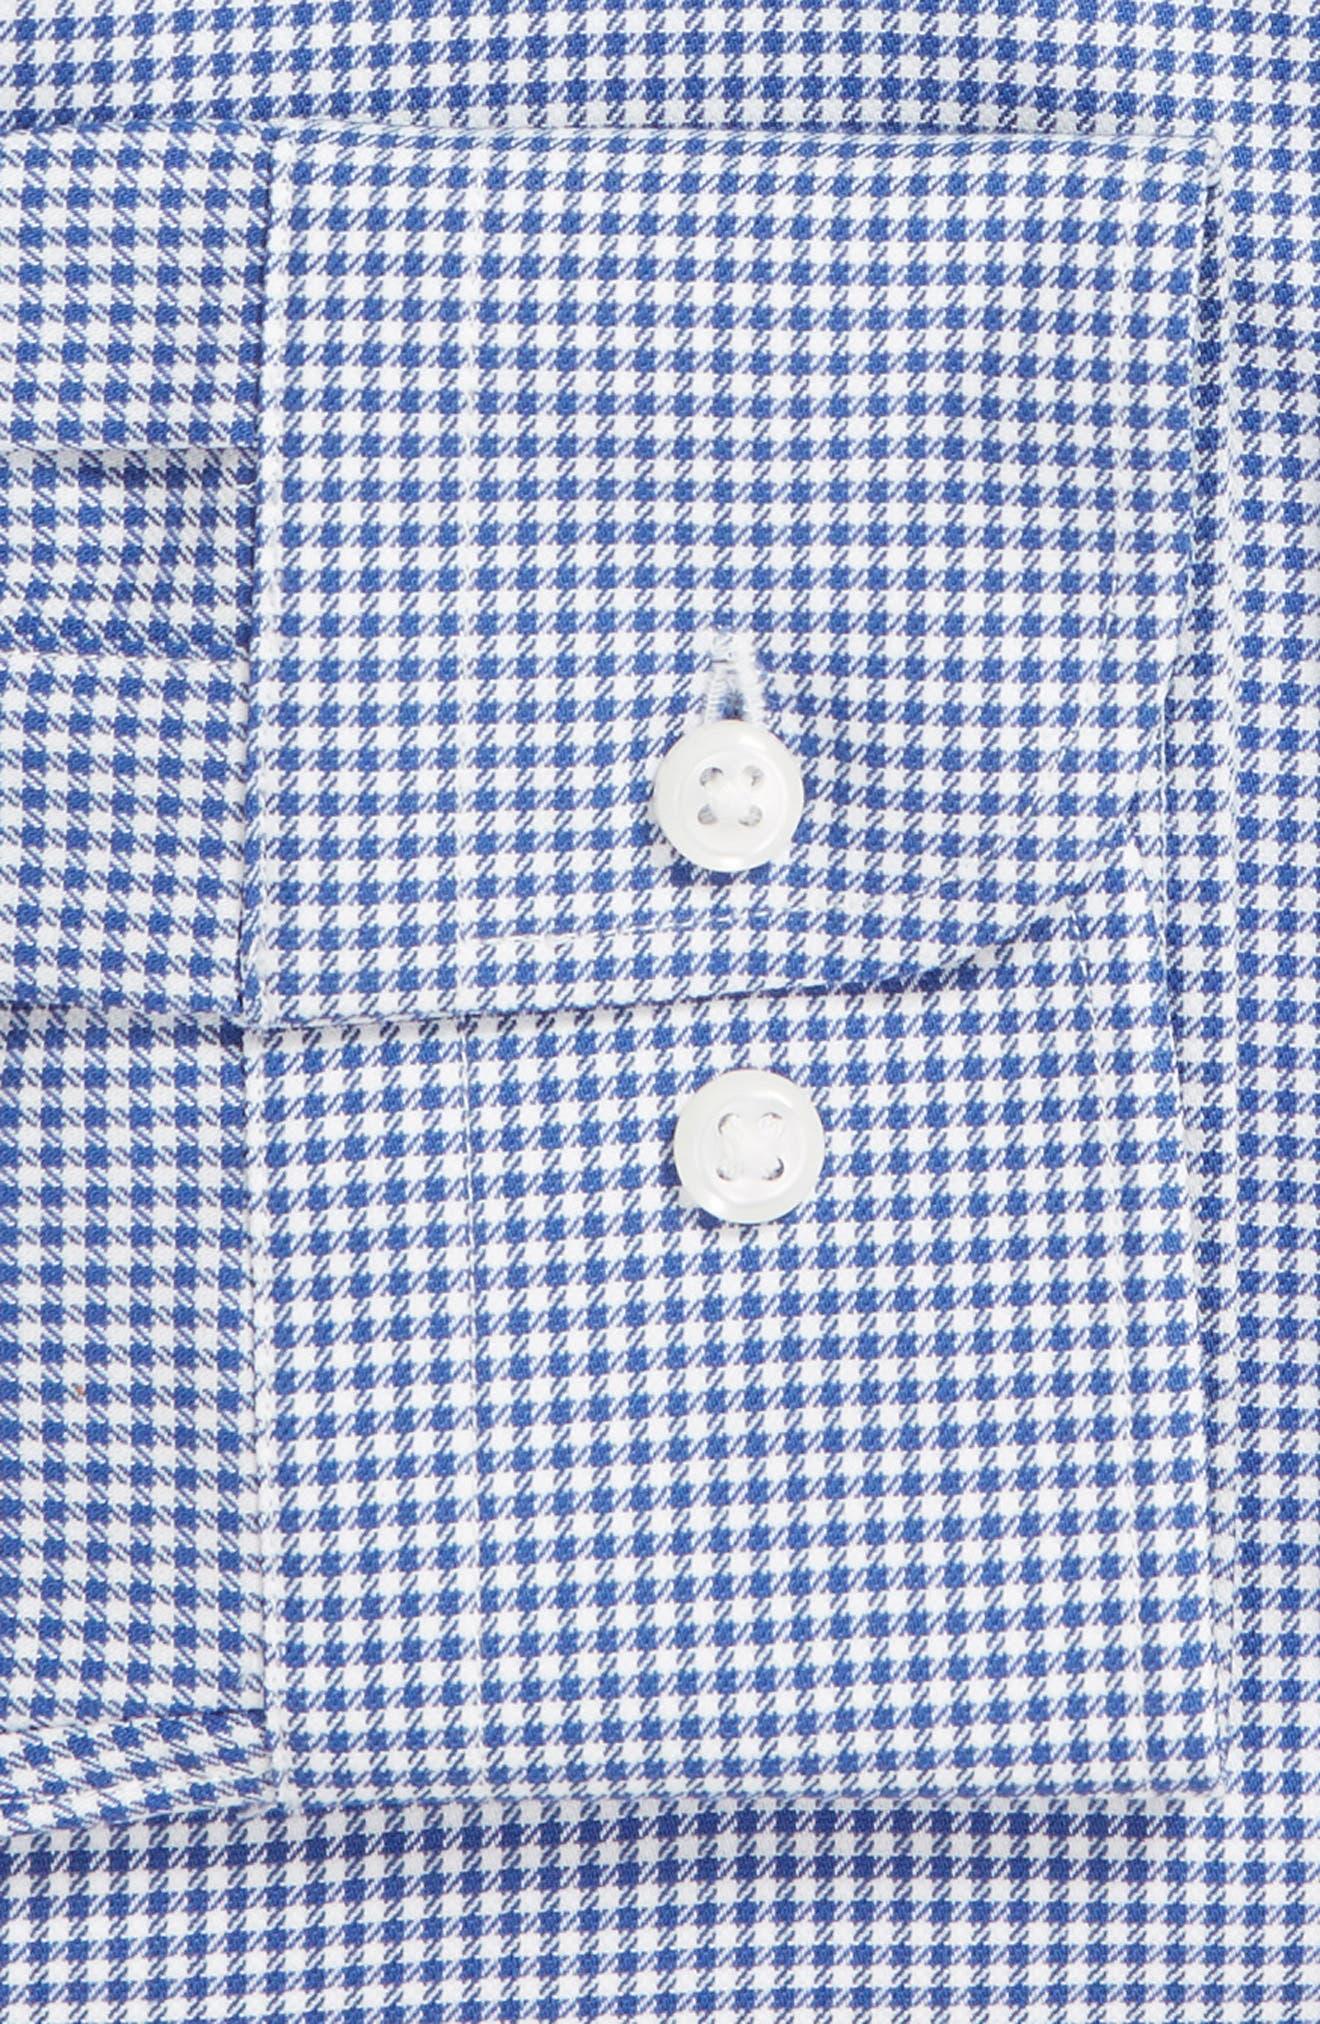 Tech-Smart Trim Fit Stretch Check Dress Shirt,                             Alternate thumbnail 6, color,                             BLUE MARINE